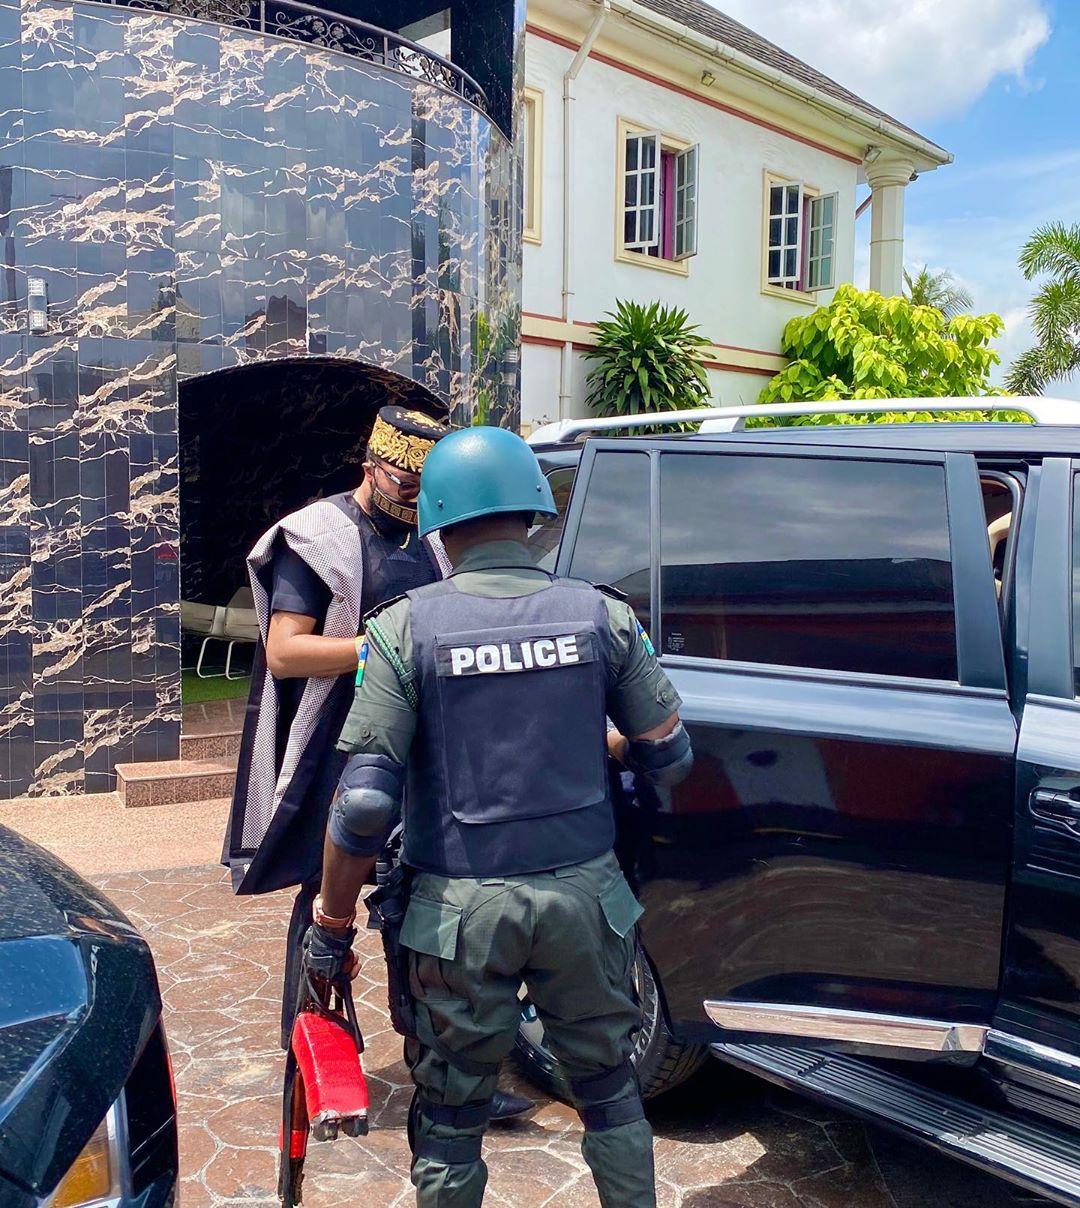 e-money-police-escorts-policemen-withdrawn-covid-orgarnics-nigeria-fifa-women-u-17-date-latest-news-global-world-stories-monday-may-2020-style-rave